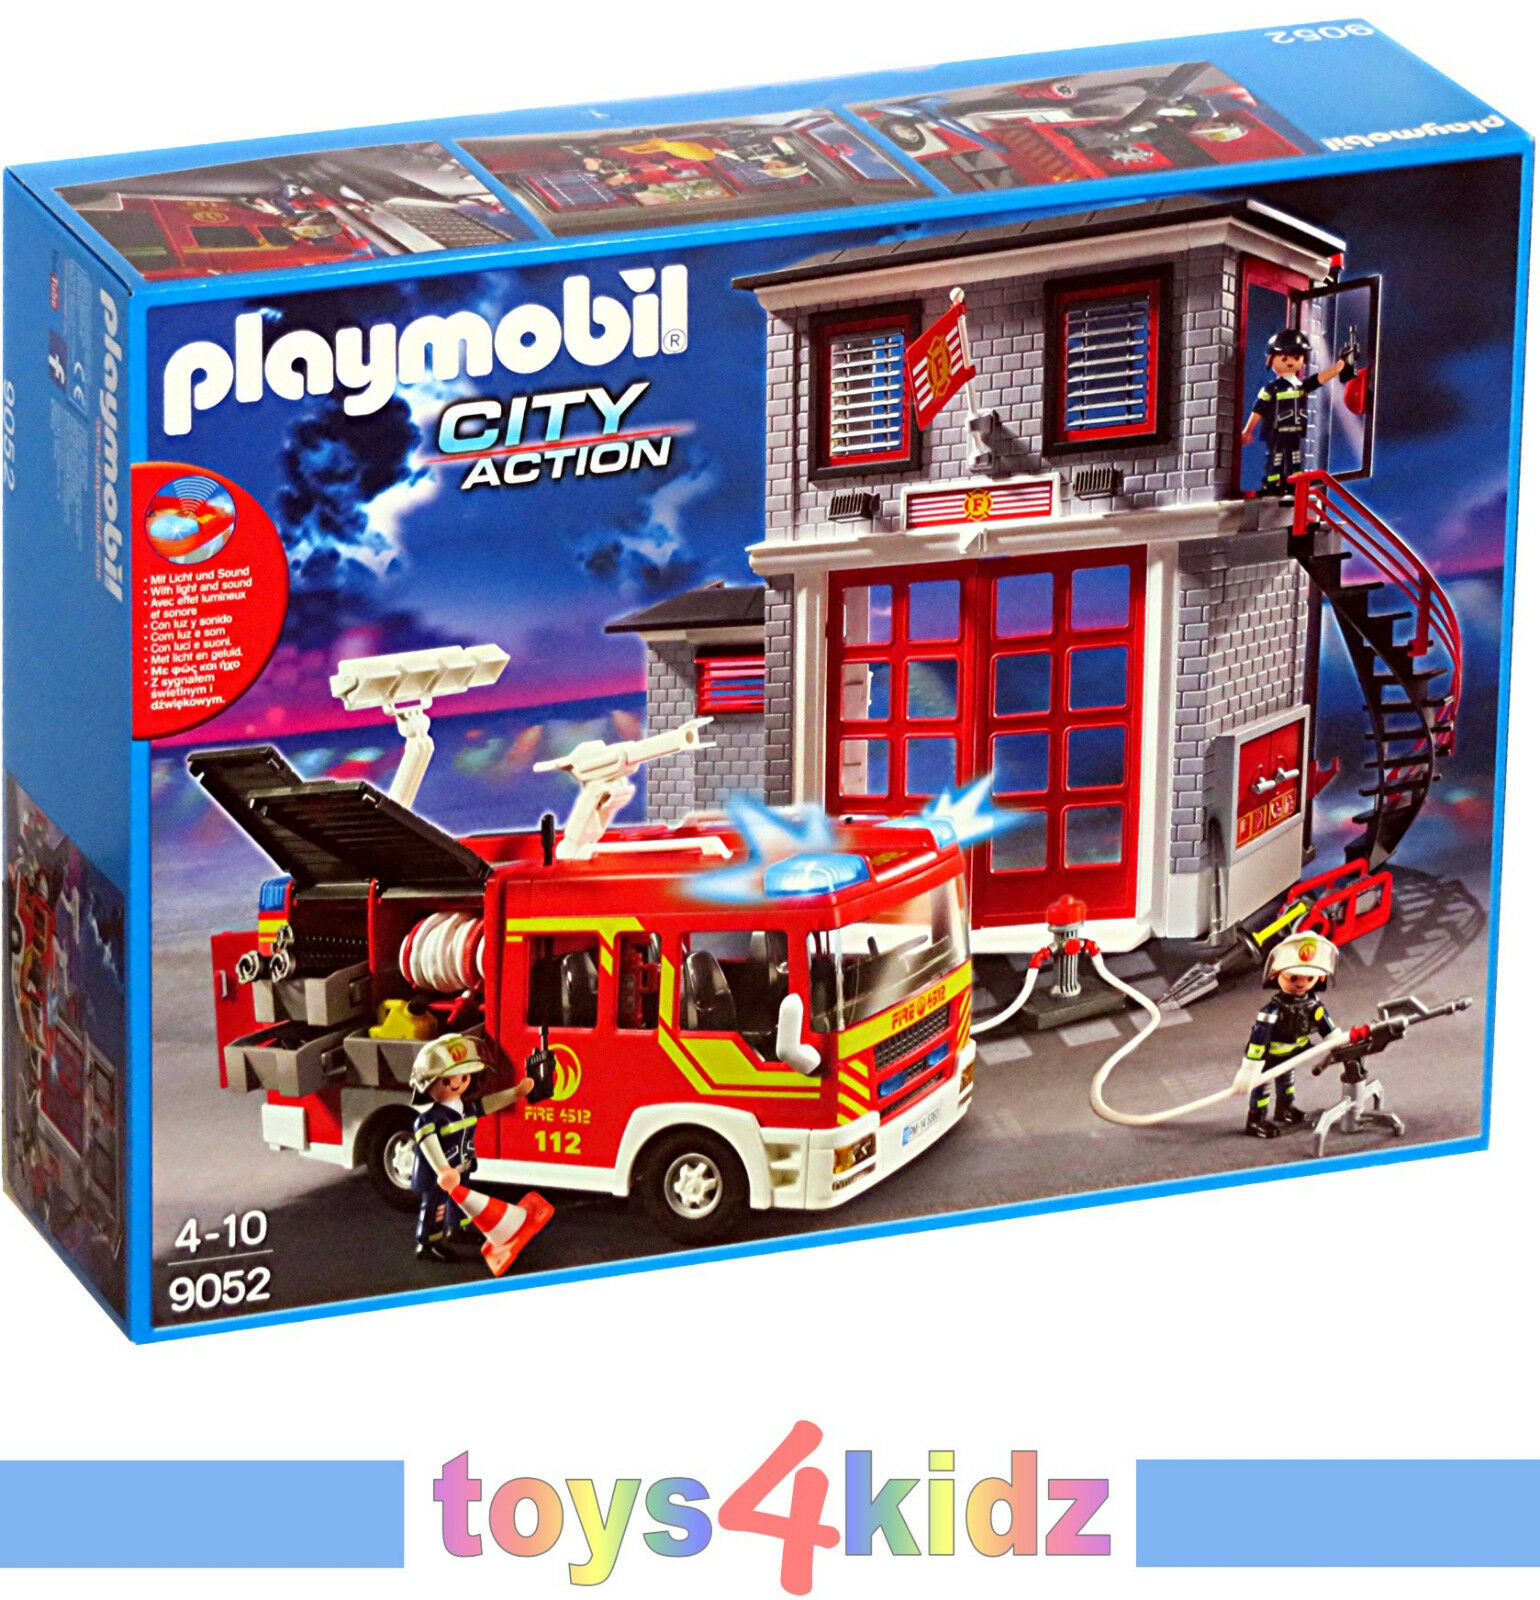 PLAYMOBIL®  CITY CITY CITY ACTION  Feuerwehr 9462 - 9468 3128 - 9052   NEU   OVP  e54211